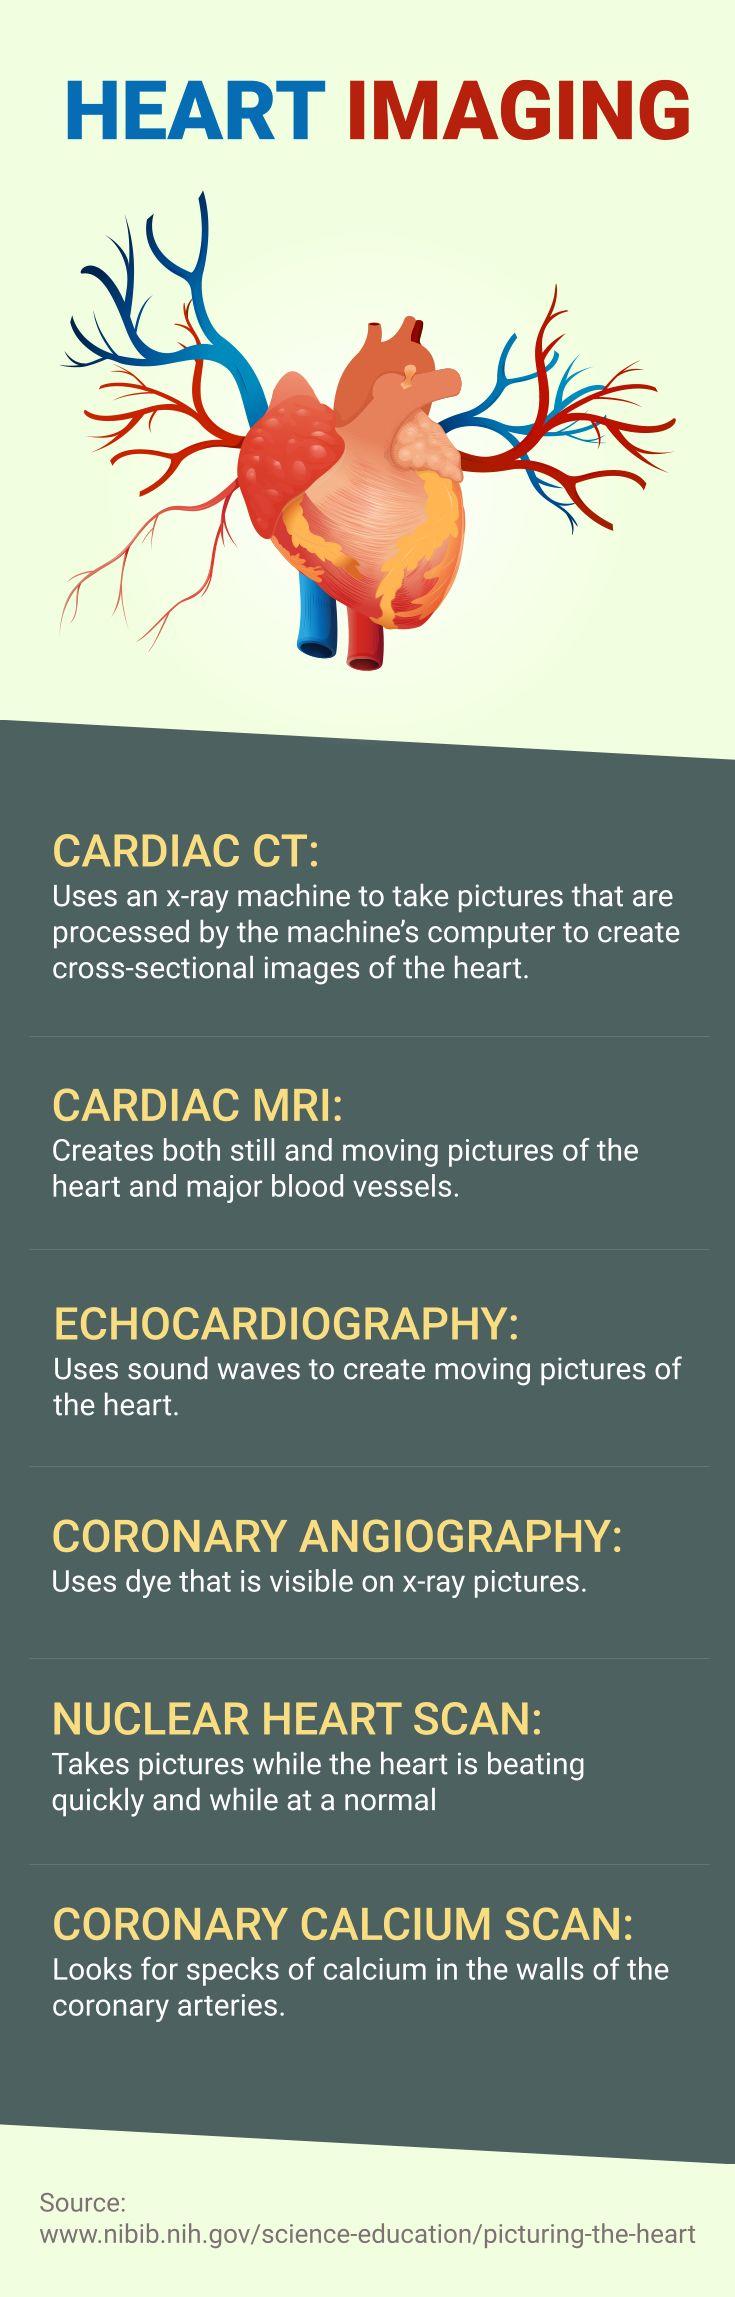 Heart imaging ctscan mri heartscan heart images mri